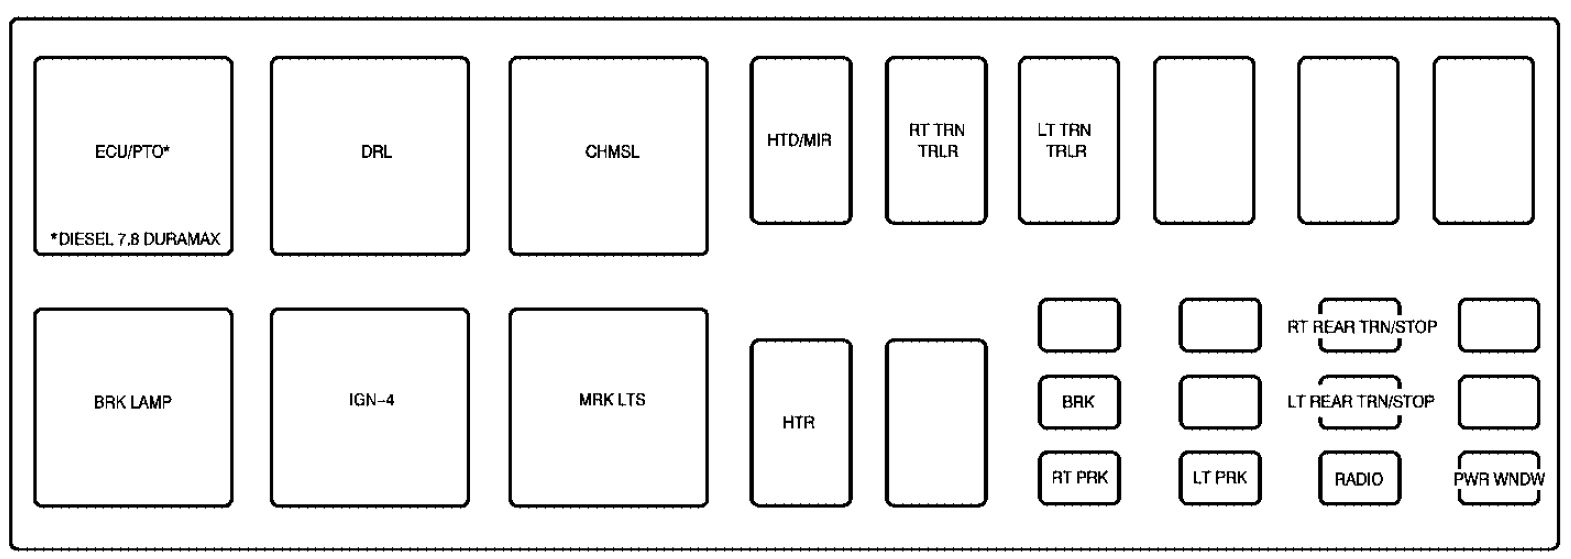 Comfortable Gmc C6500 2005 Medium Trucks Ivoiregion T7500 Wiring Diagrams 2001 Diagram O For Free